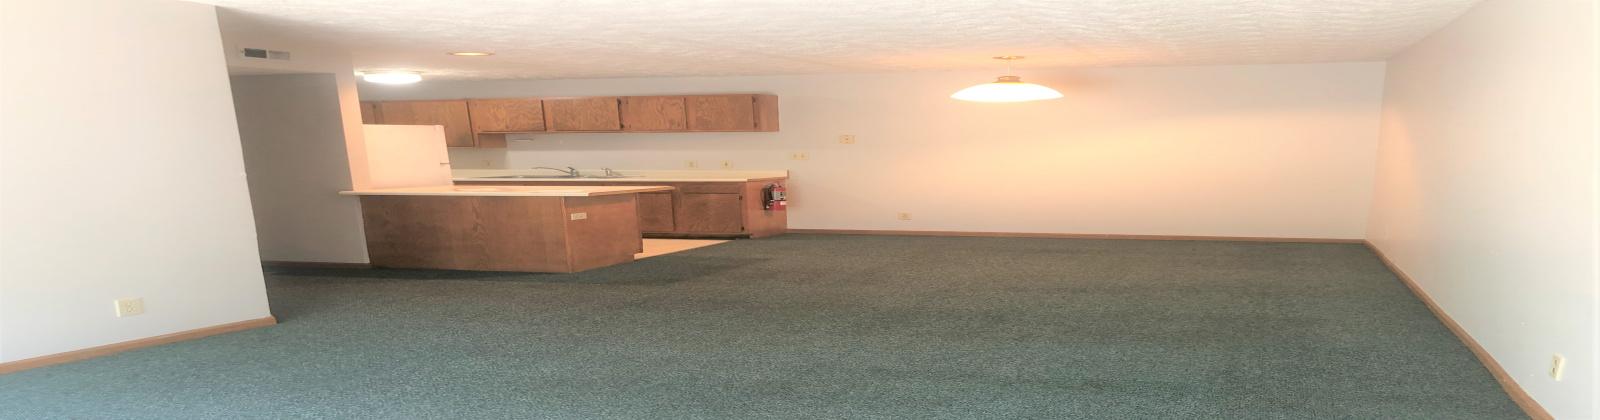 247 W Union Street APT 101C Athens, Ohio, 3 Bedrooms Bedrooms, ,2 BathroomsBathrooms,Apartment,For Rent,W Union,1112